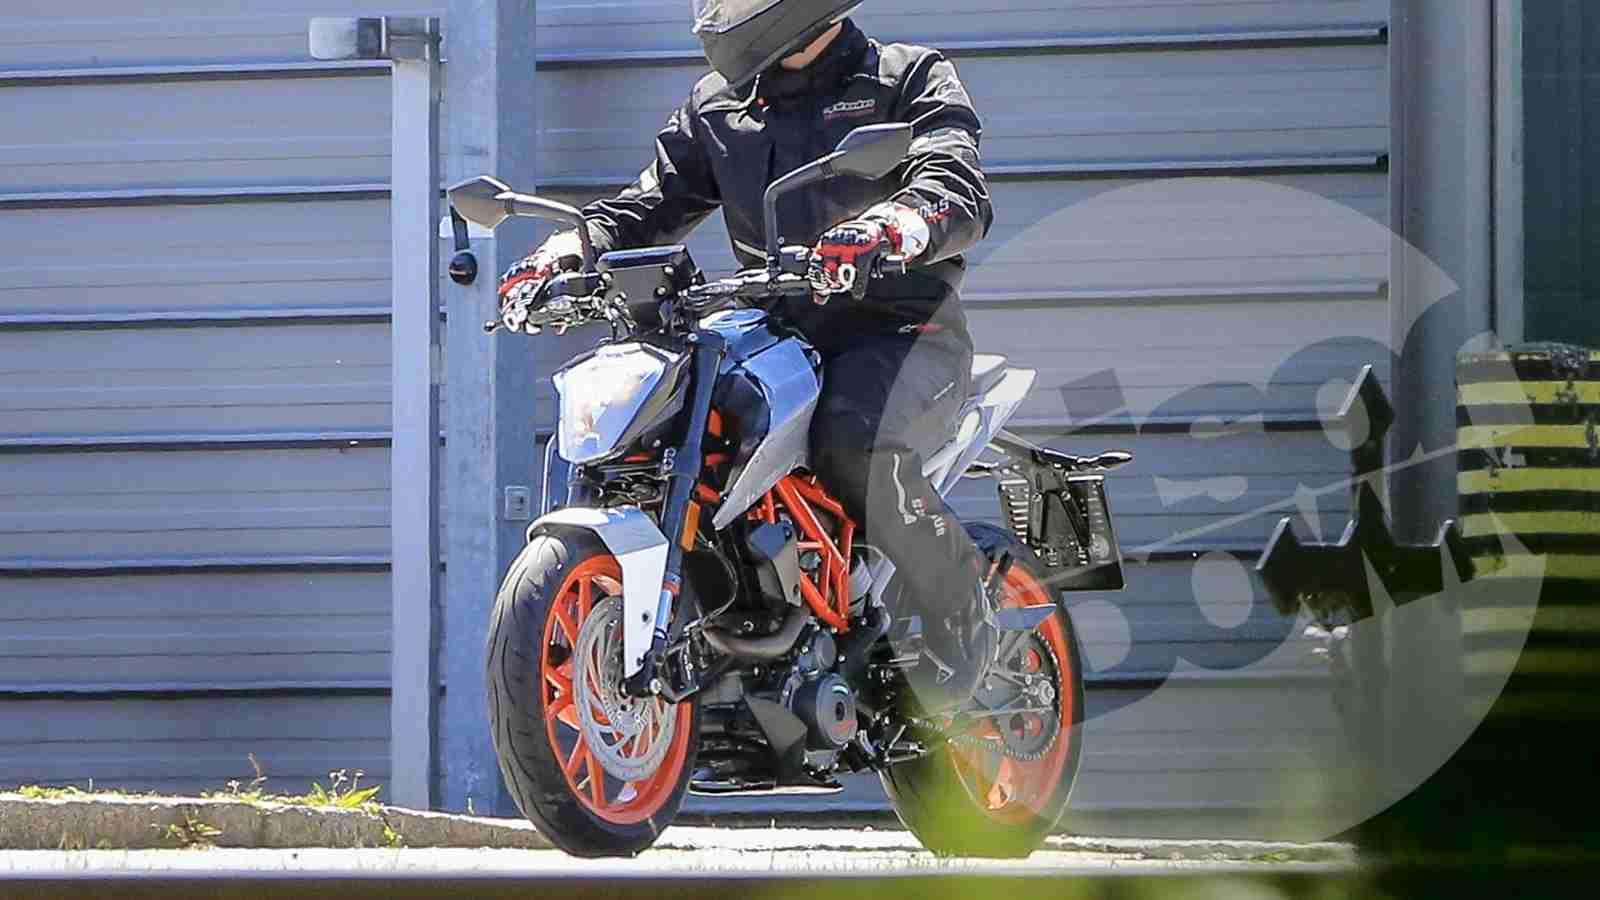 2017 ktm duke 125 spotted testing iamabiker everything motorcycle. Black Bedroom Furniture Sets. Home Design Ideas